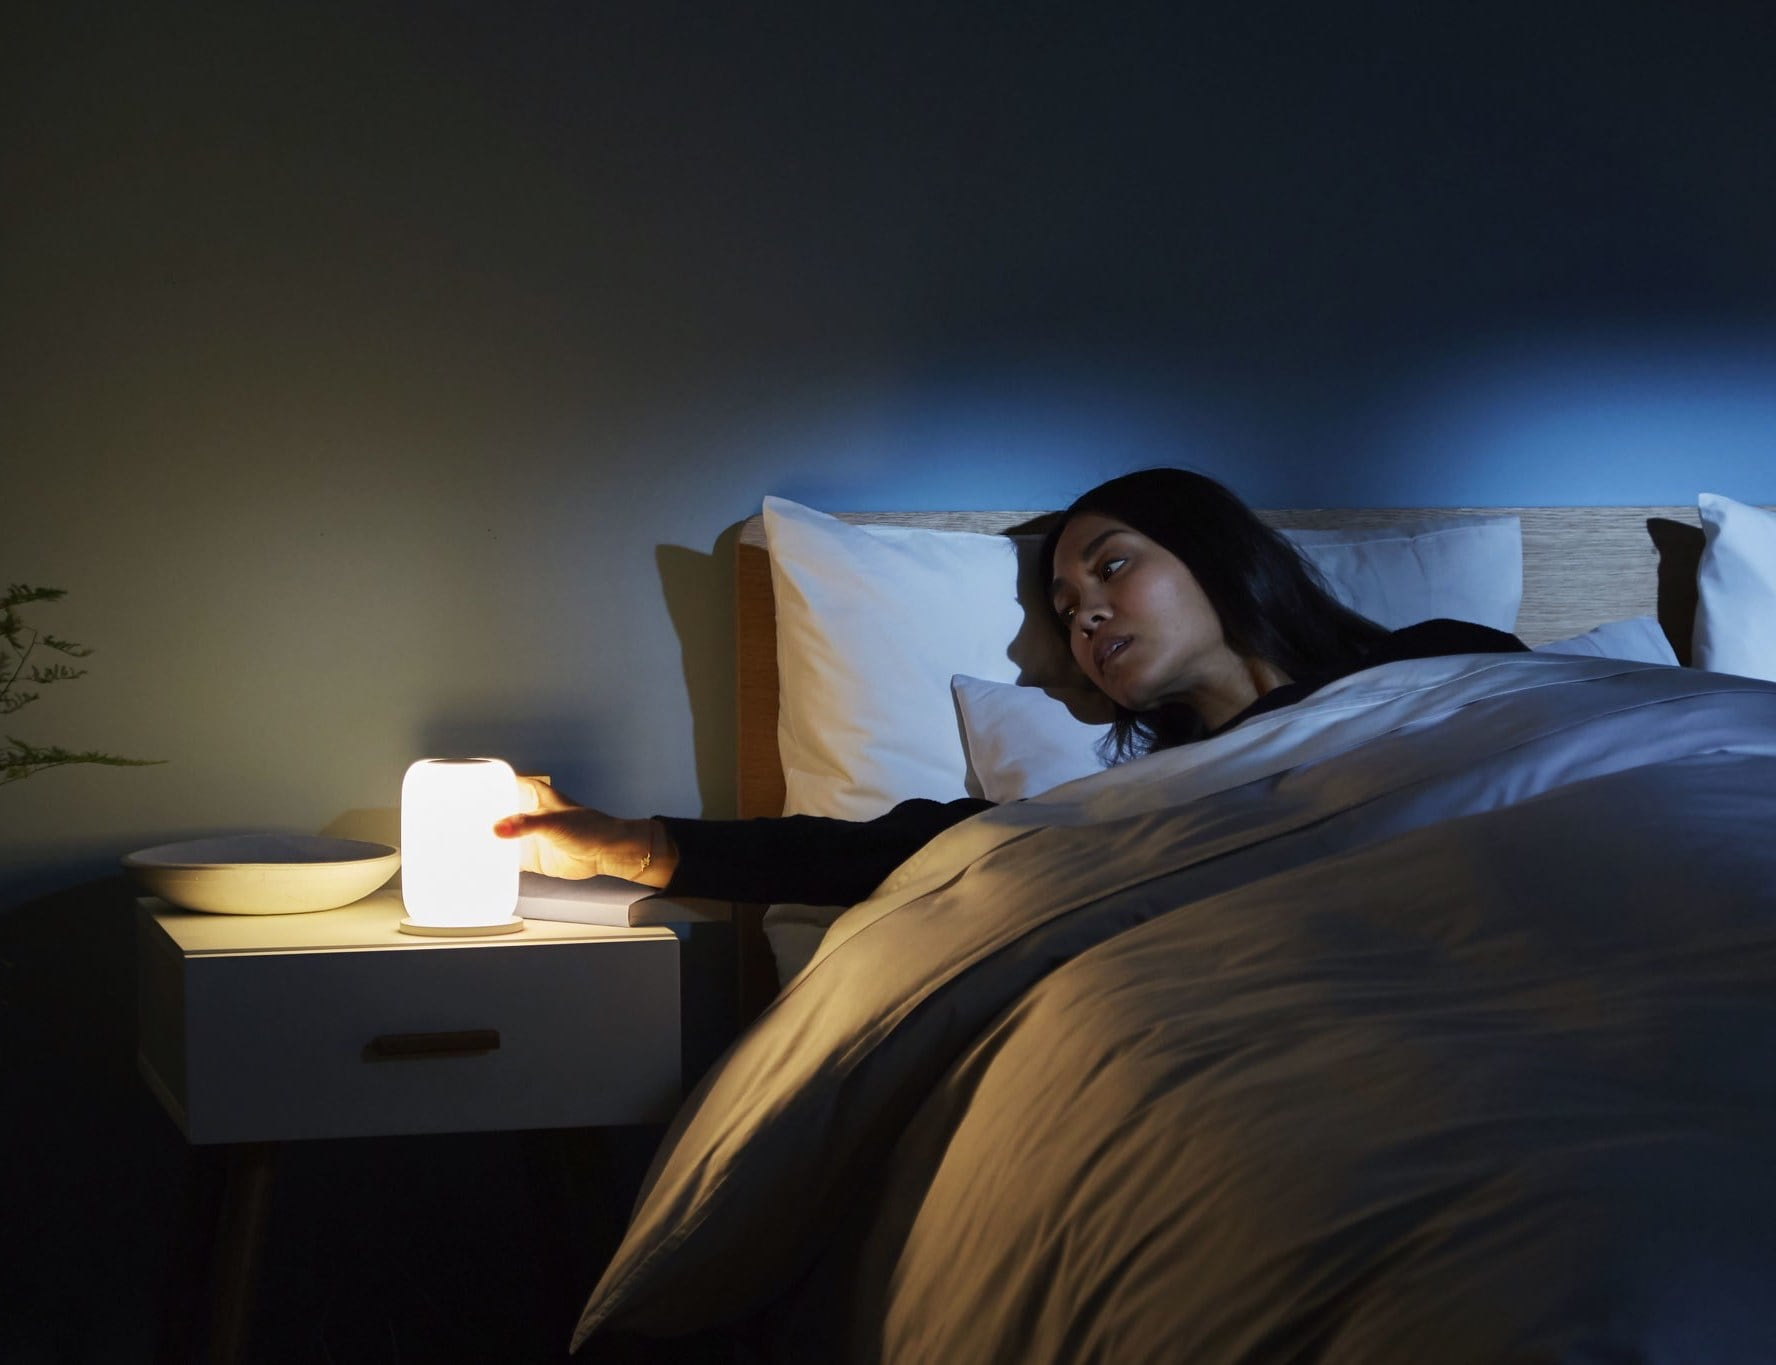 10 Sleep tech gadgets to help you get some shuteye - Casper 01